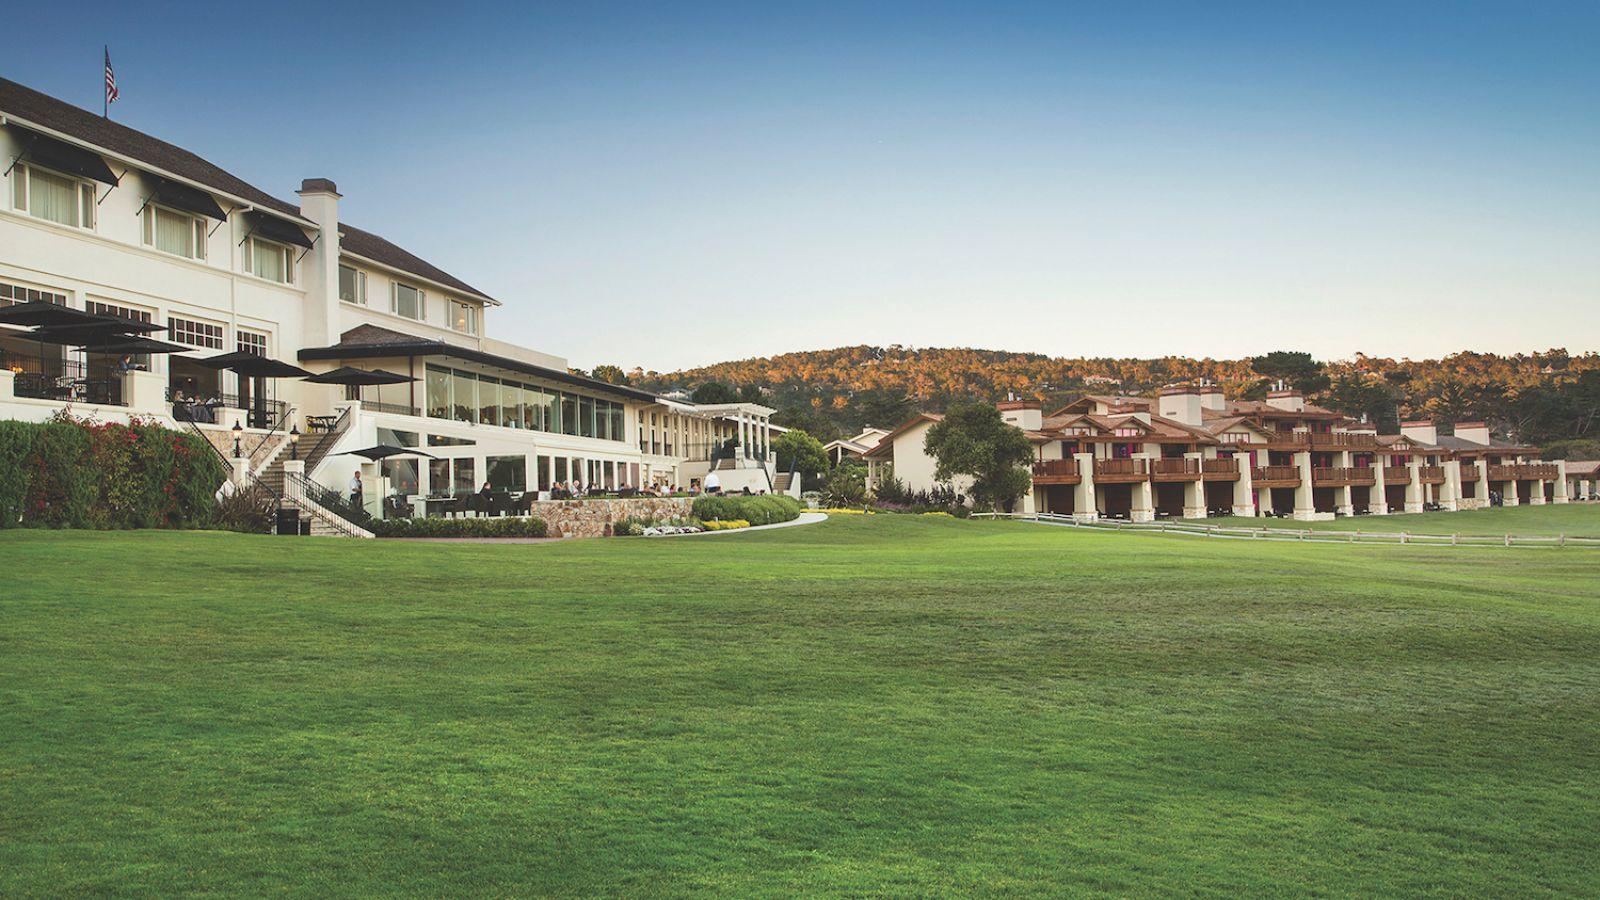 The Lodge at Pebble Beach™ Historic Main Building New Building -  Pebble Beach Resorts®  © Noah Webb